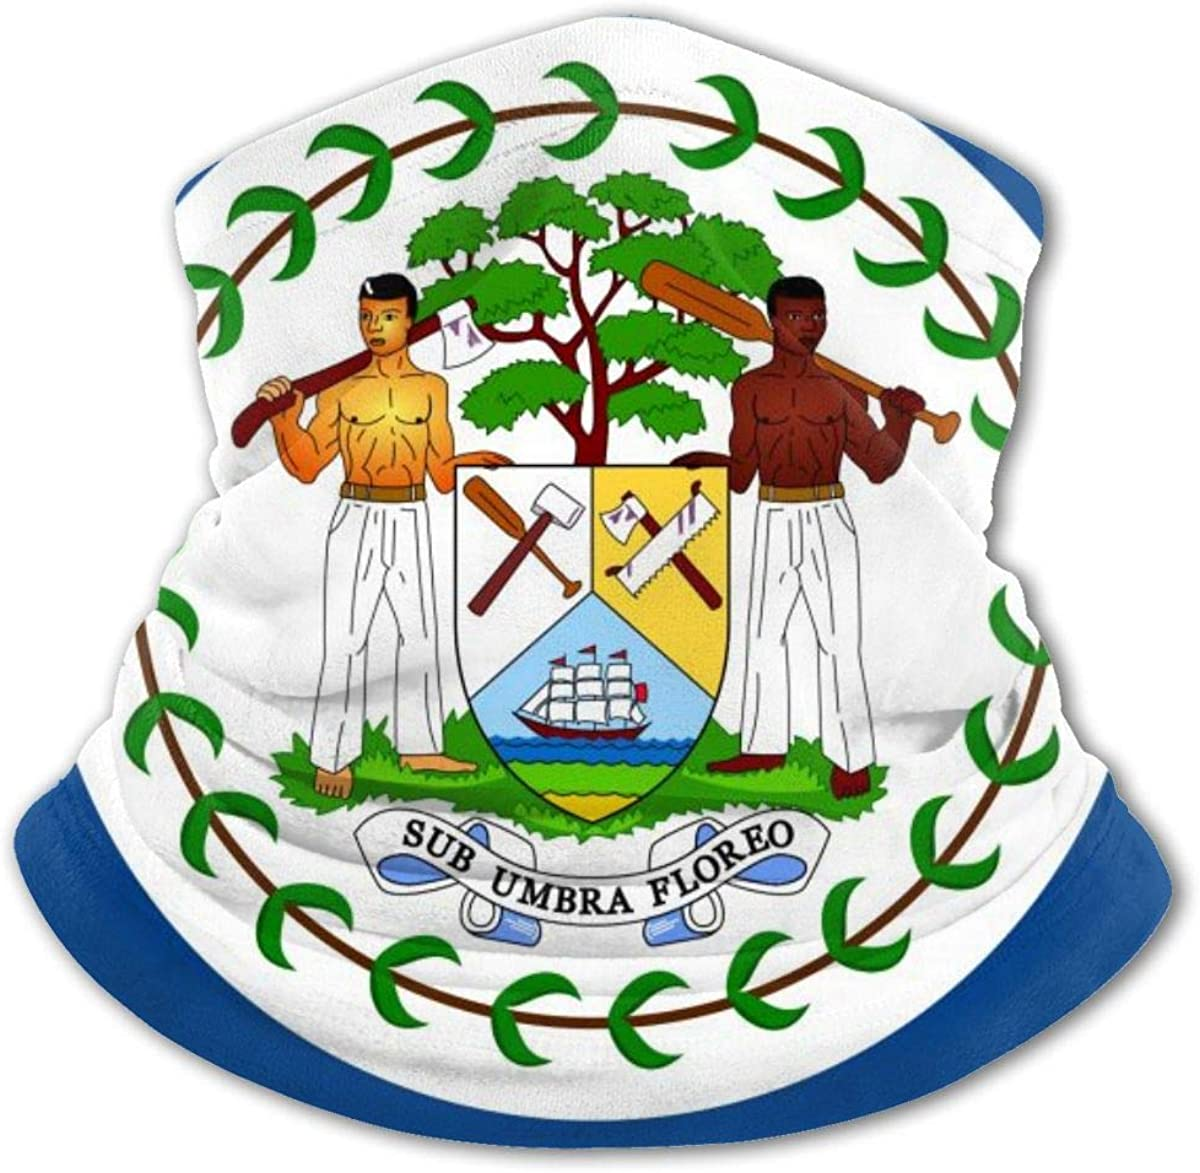 Flag Of Belize Headwear For Girls And Boys, Head Wrap, Neck Gaiter, Headband, Tenn Fishing Mask, Magic Scarf, Tube Mask, Face Bandana Mask For Camping Running Cycling